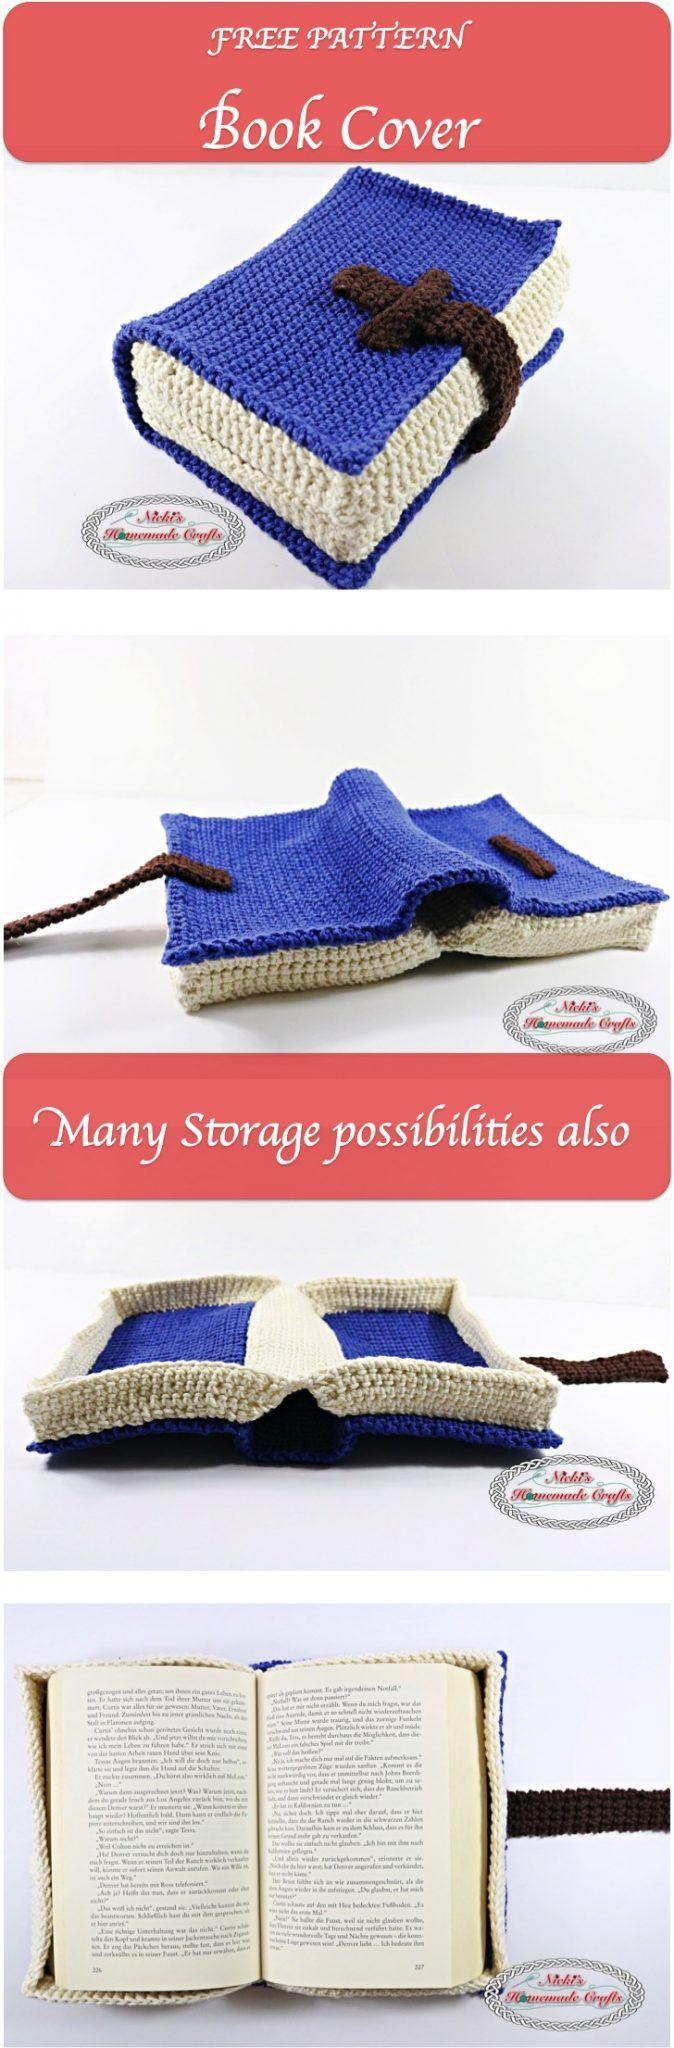 Free Crochet Paperback Book Cover Pattern : Best crochet book cover ideas on pinterest